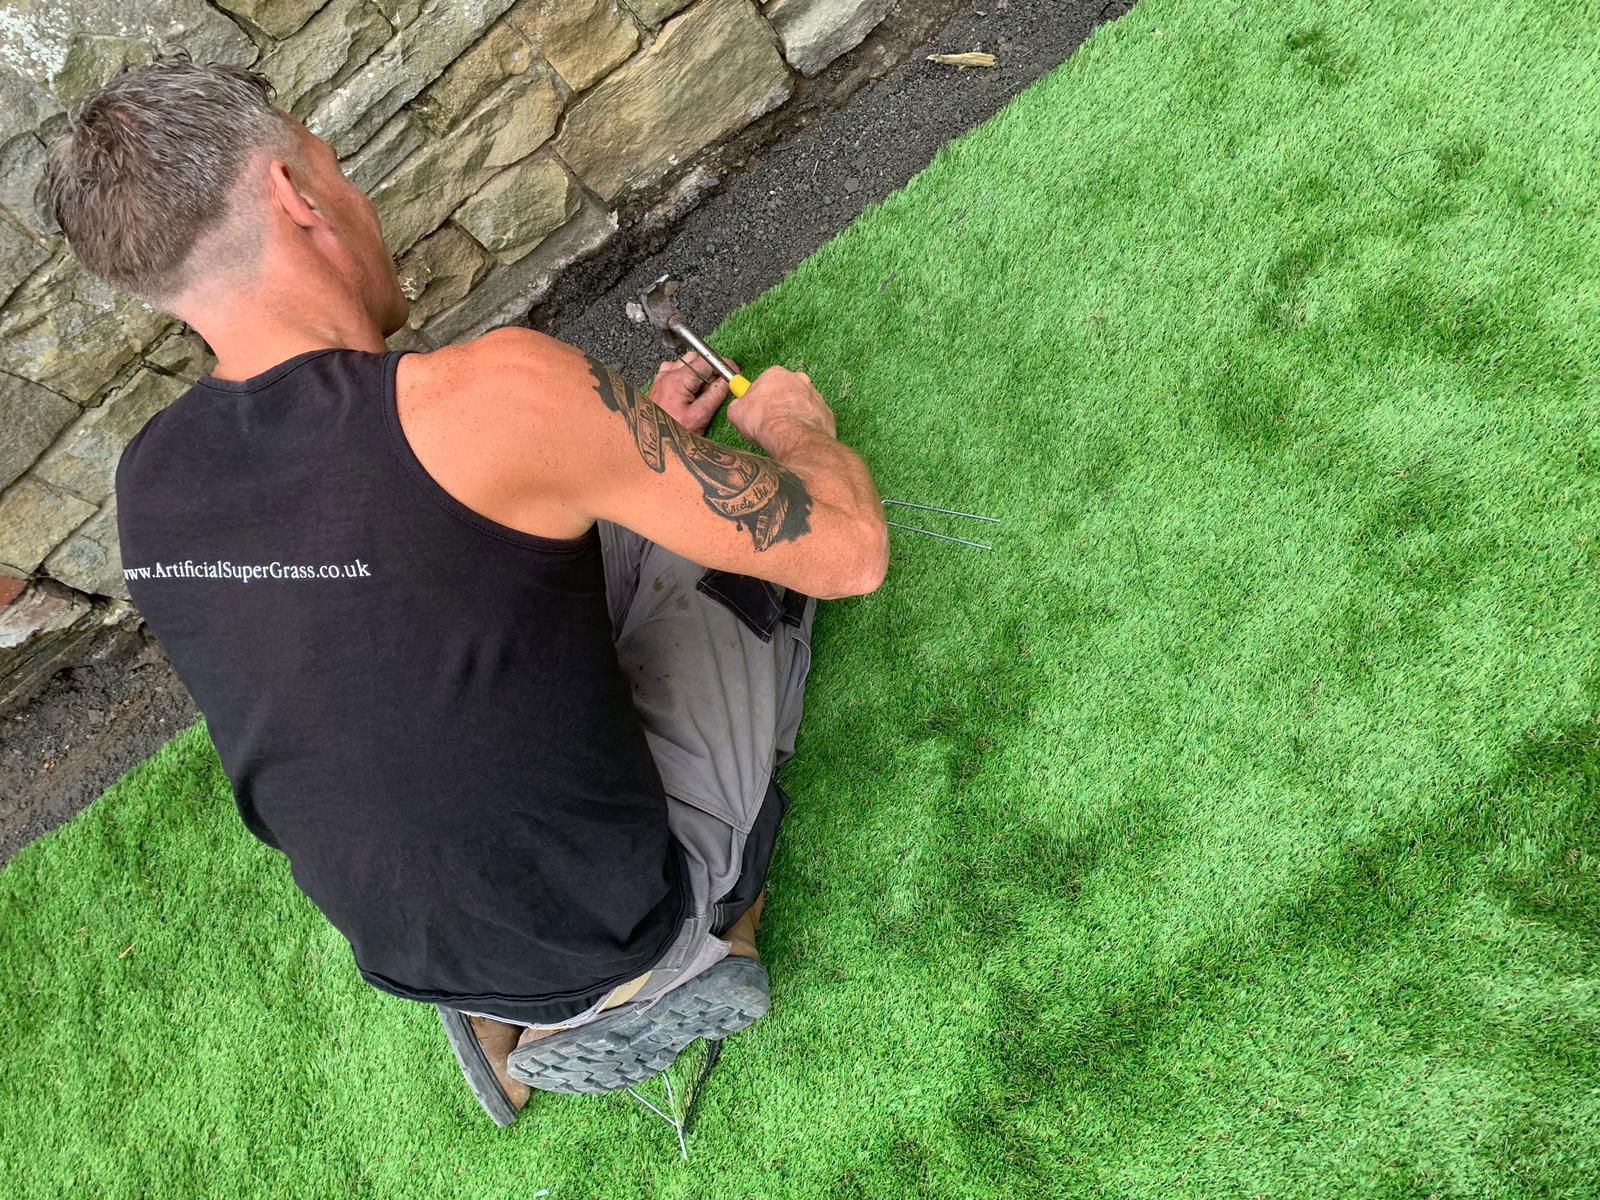 Artificial Grass Redcar and Cleveland Artificial Super Grass